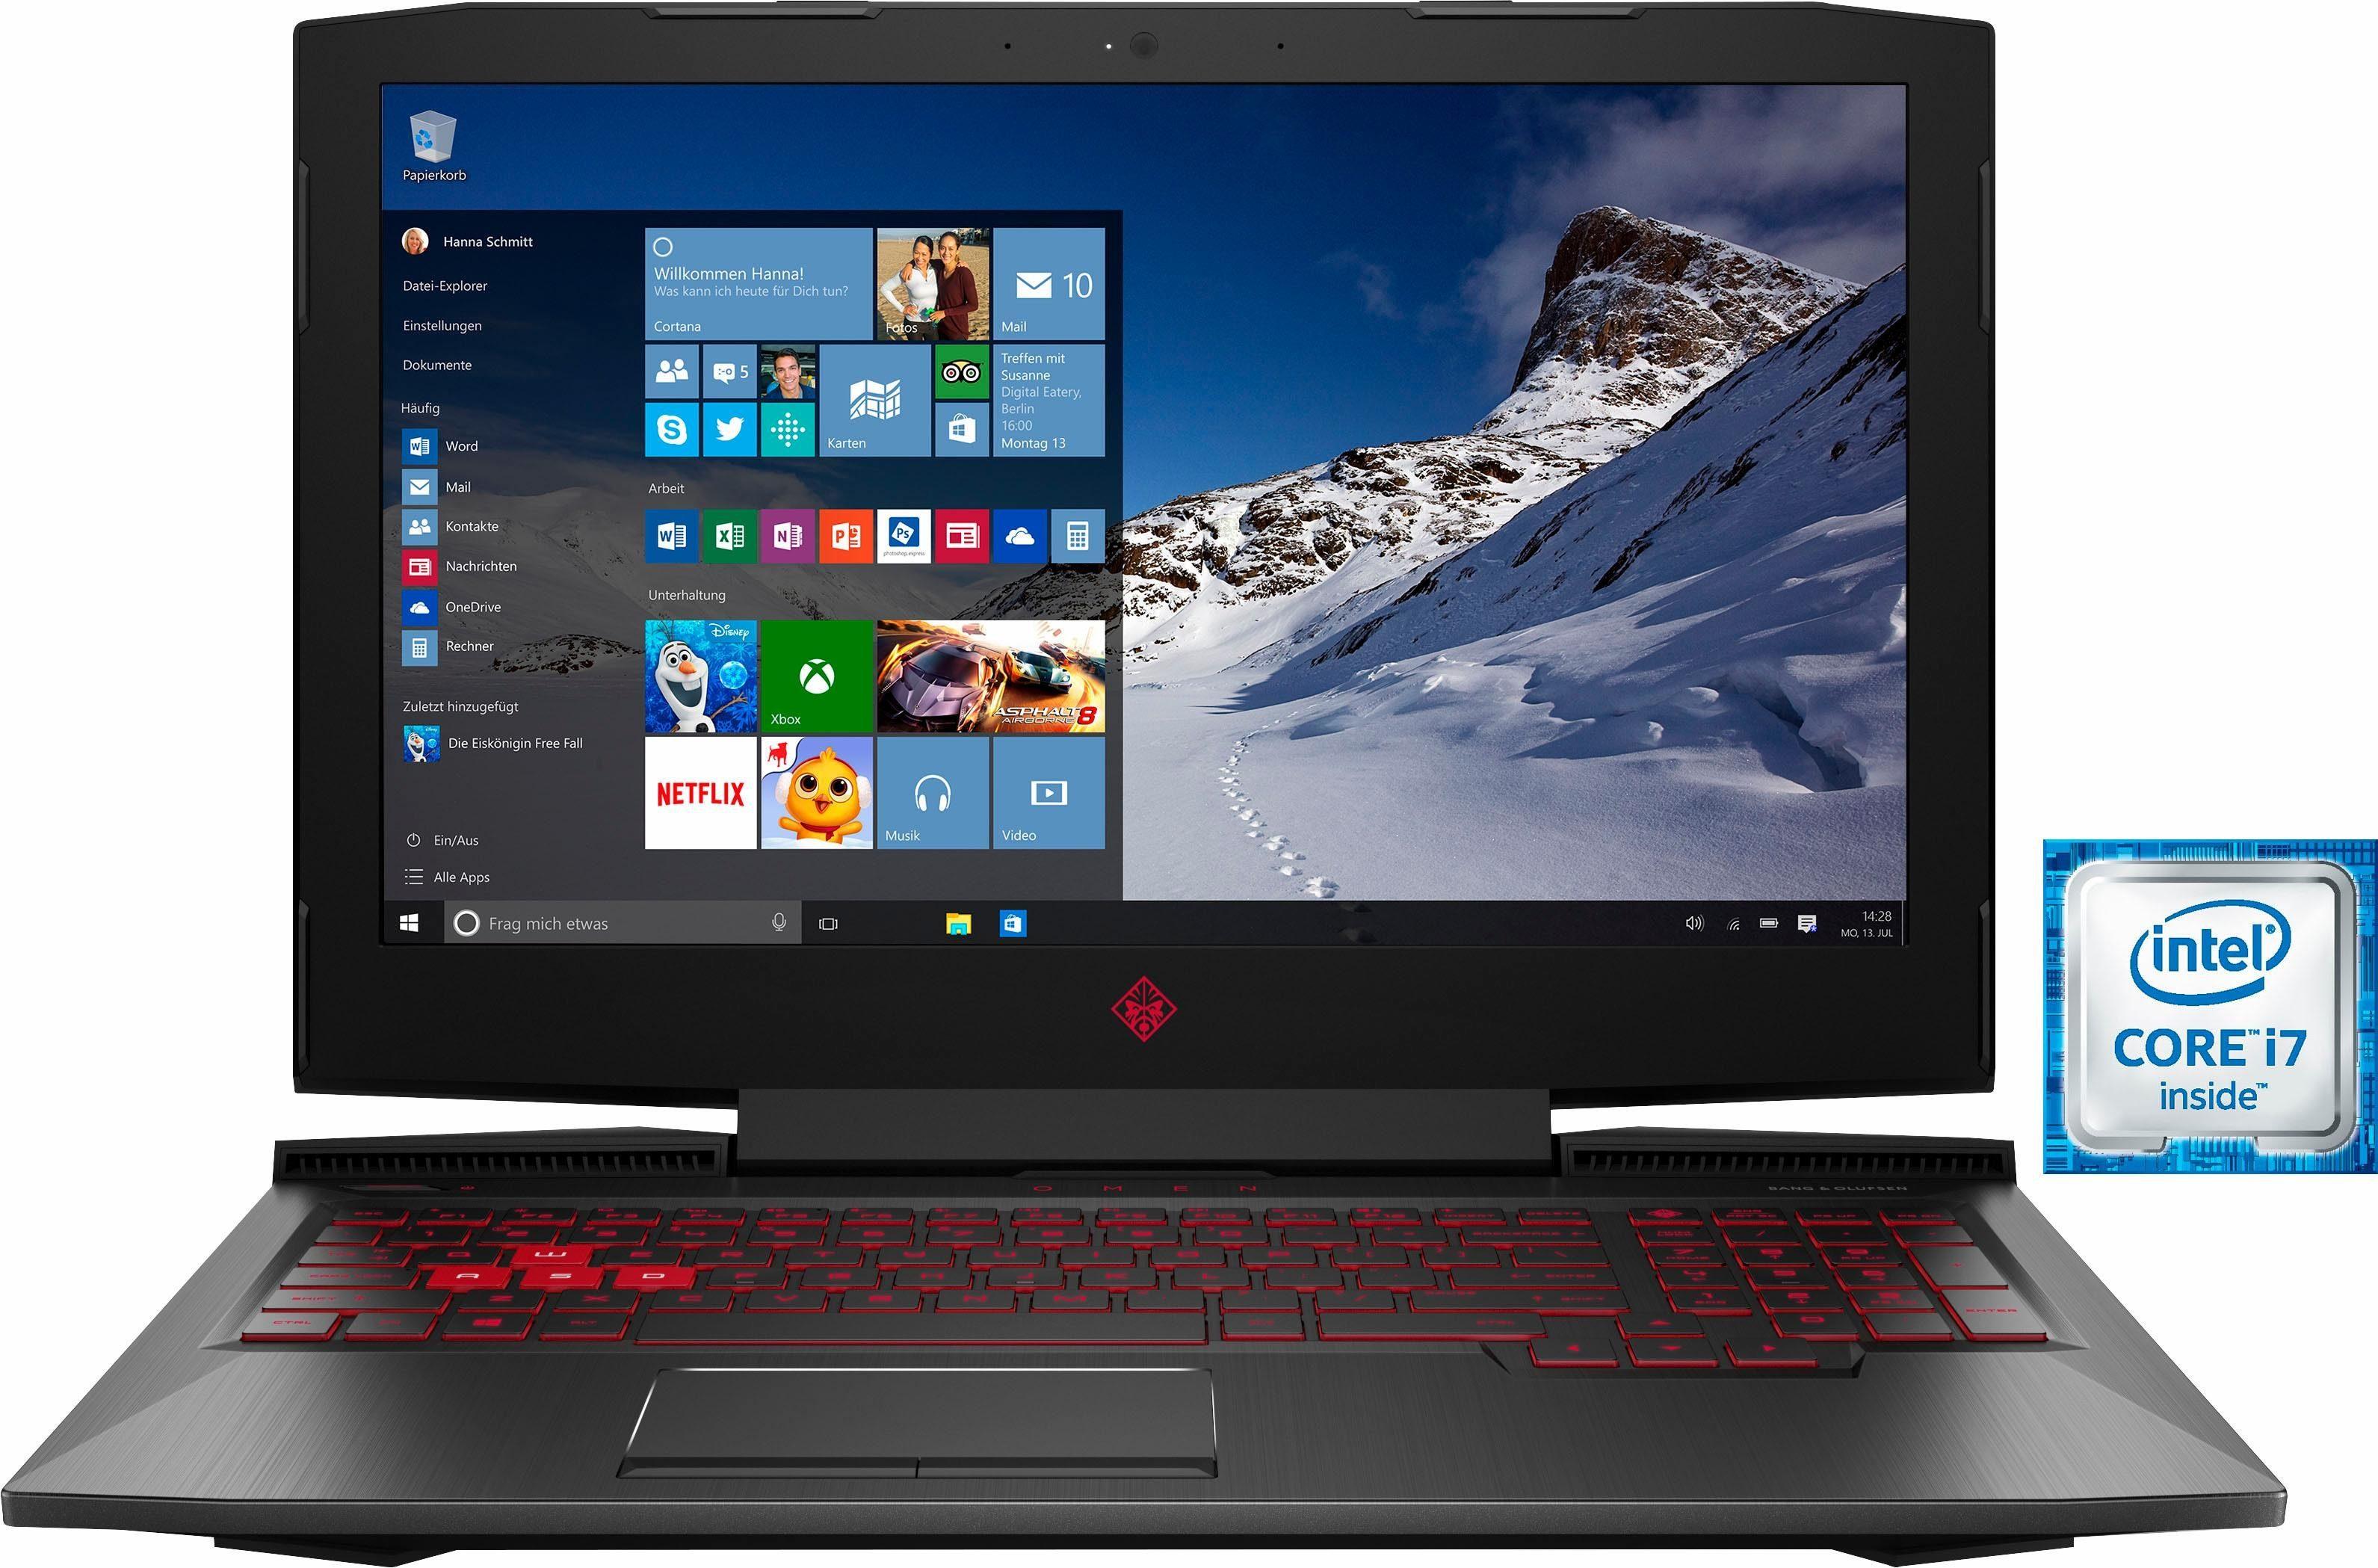 OMEN by HP 15-ce002ng Gaming Notebook (39,6 cm/15,6 Zoll, 120 Hz, Intel Core i7, GTX 1060, 1000 GB HDD, 256 GB SSD)